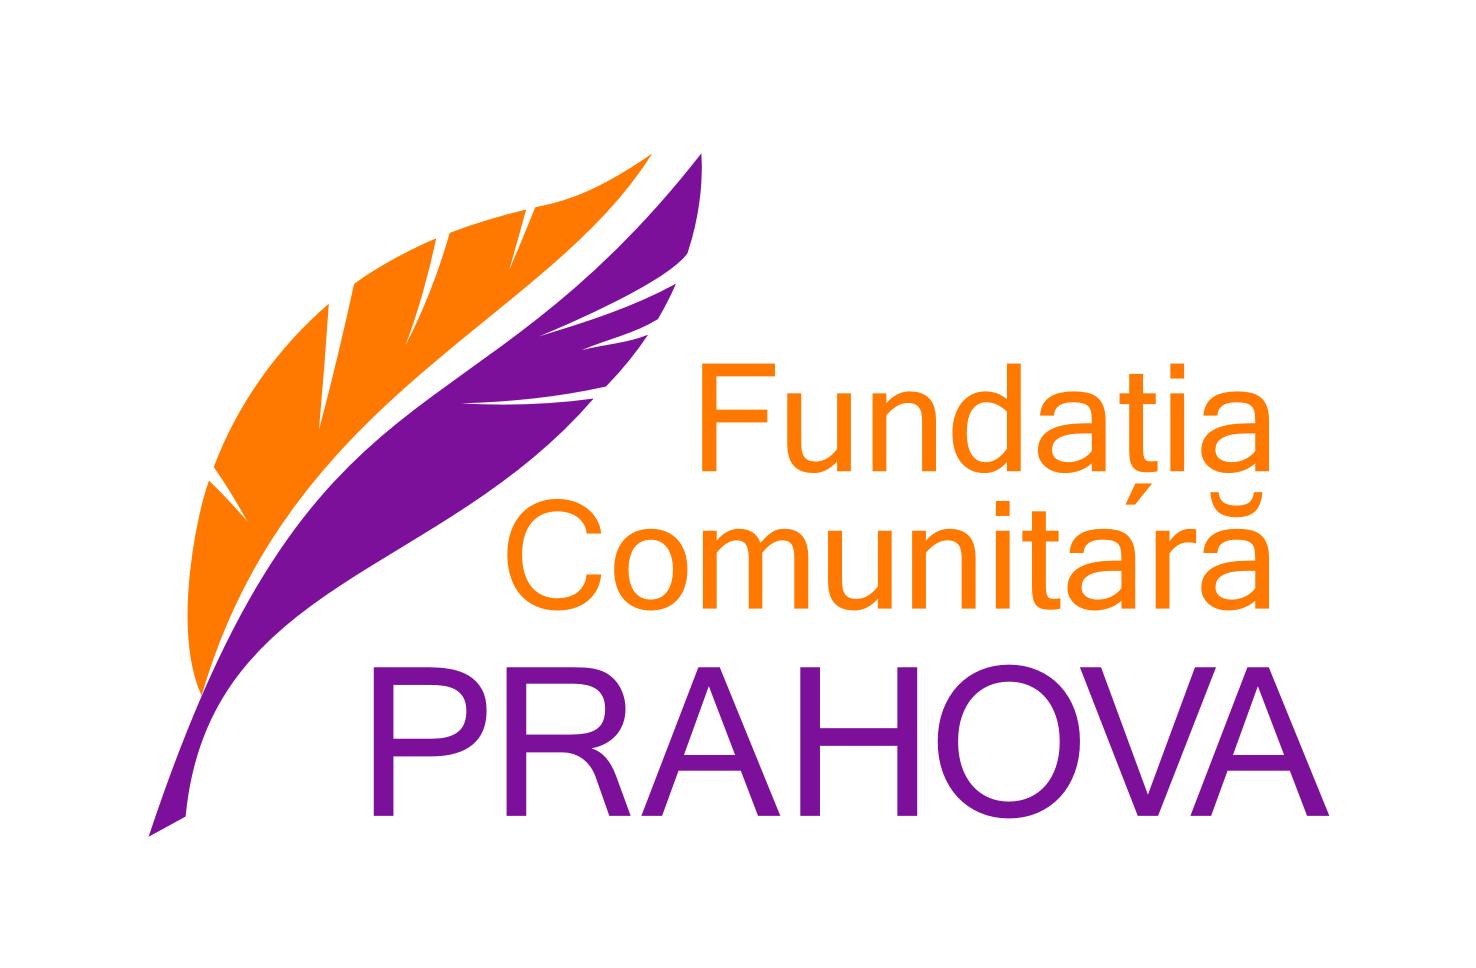 Fundația Comunitară Prahova  logo